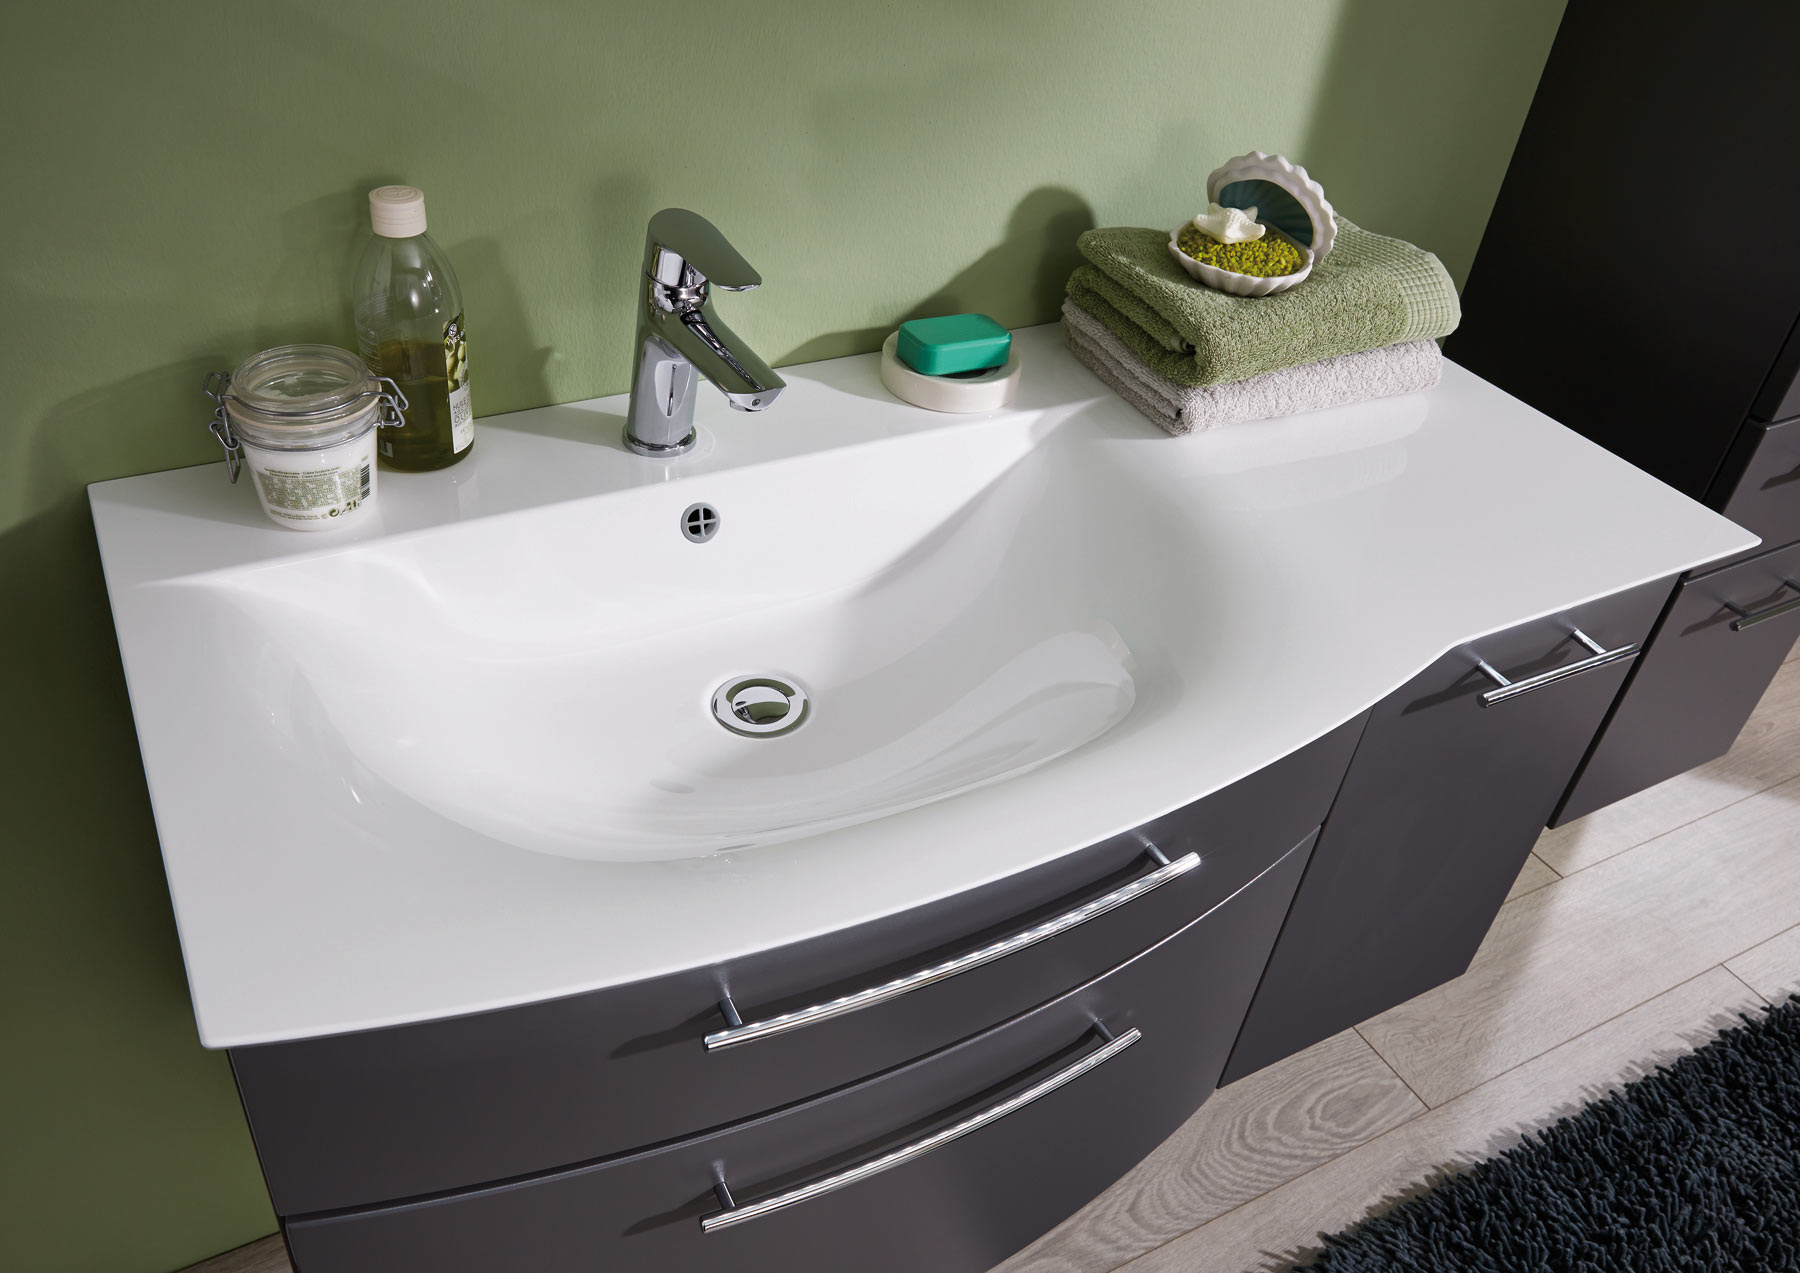 Meuble Salle De Bain Largeur 100 lotus   meubles de salle de bains, baignoires, fabricant